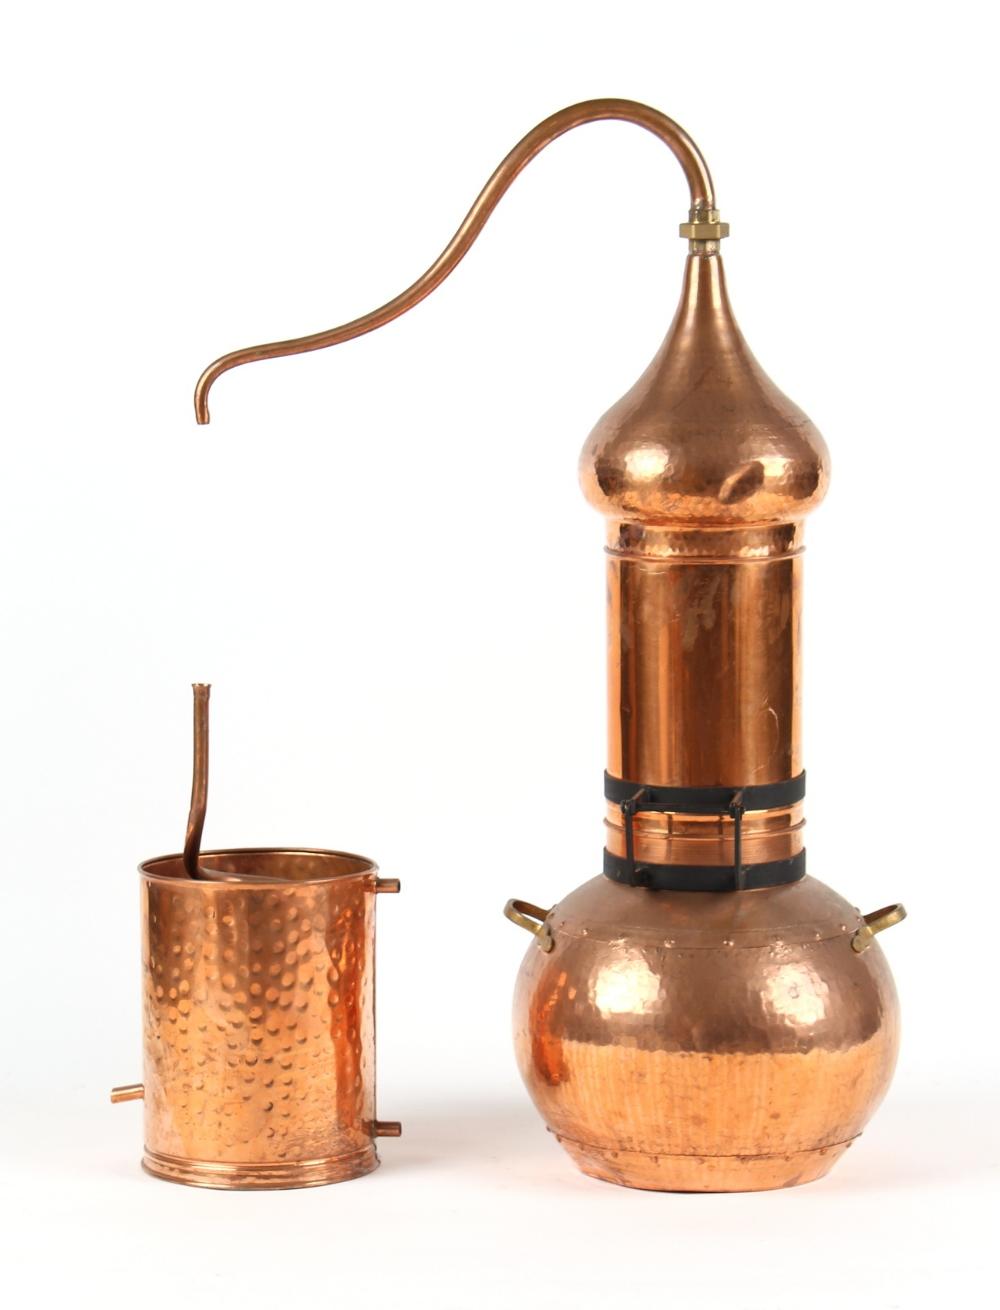 A copper alembic perfume still, 42.5ins. (108cms.) high. Provenance - L'Occitane, Salisbury.